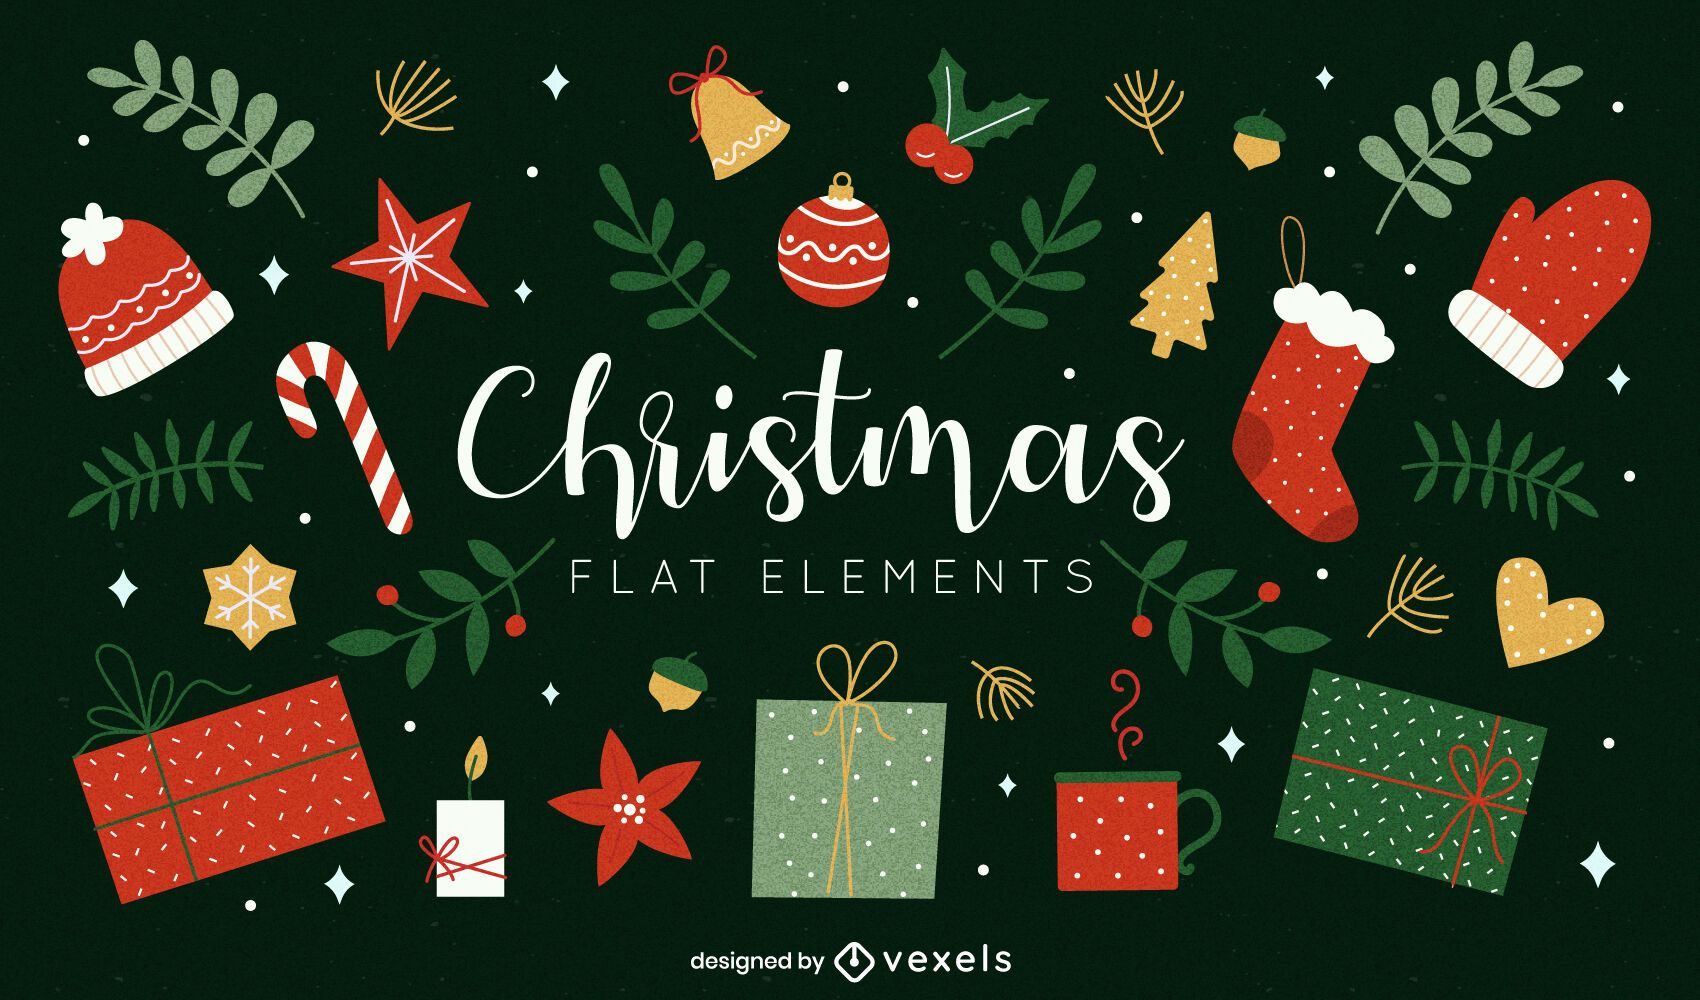 Christmas elements flat illustration set